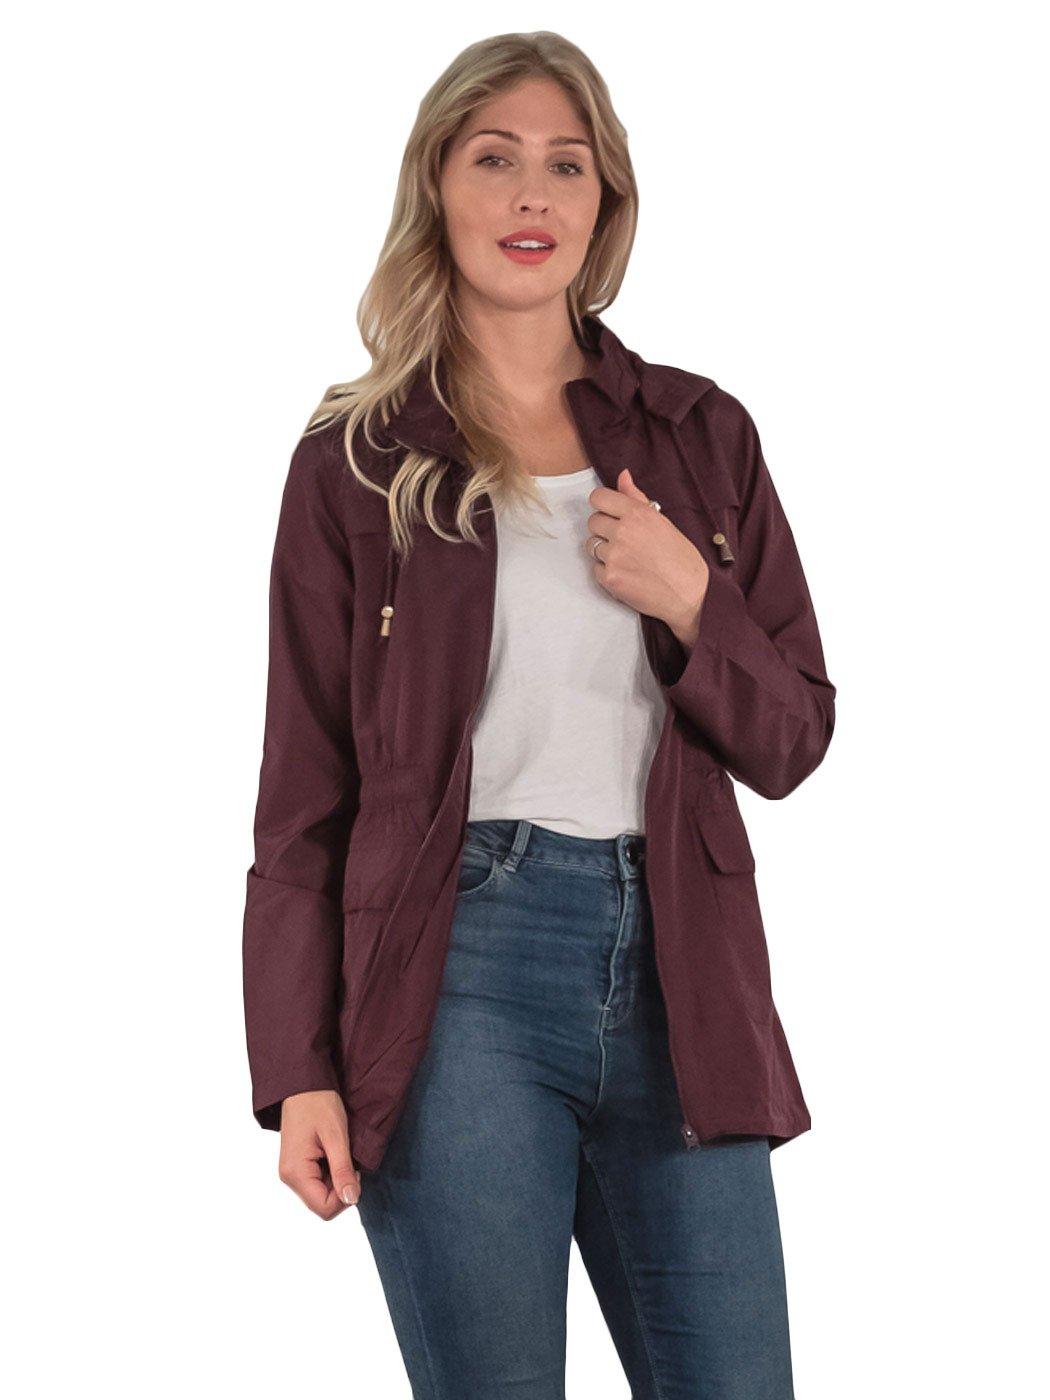 Womens-RainCoat-Plain-Hooded-Ladies-Jacket-Kagool-Parka-Long-Sleeves-Two-Pockets thumbnail 17